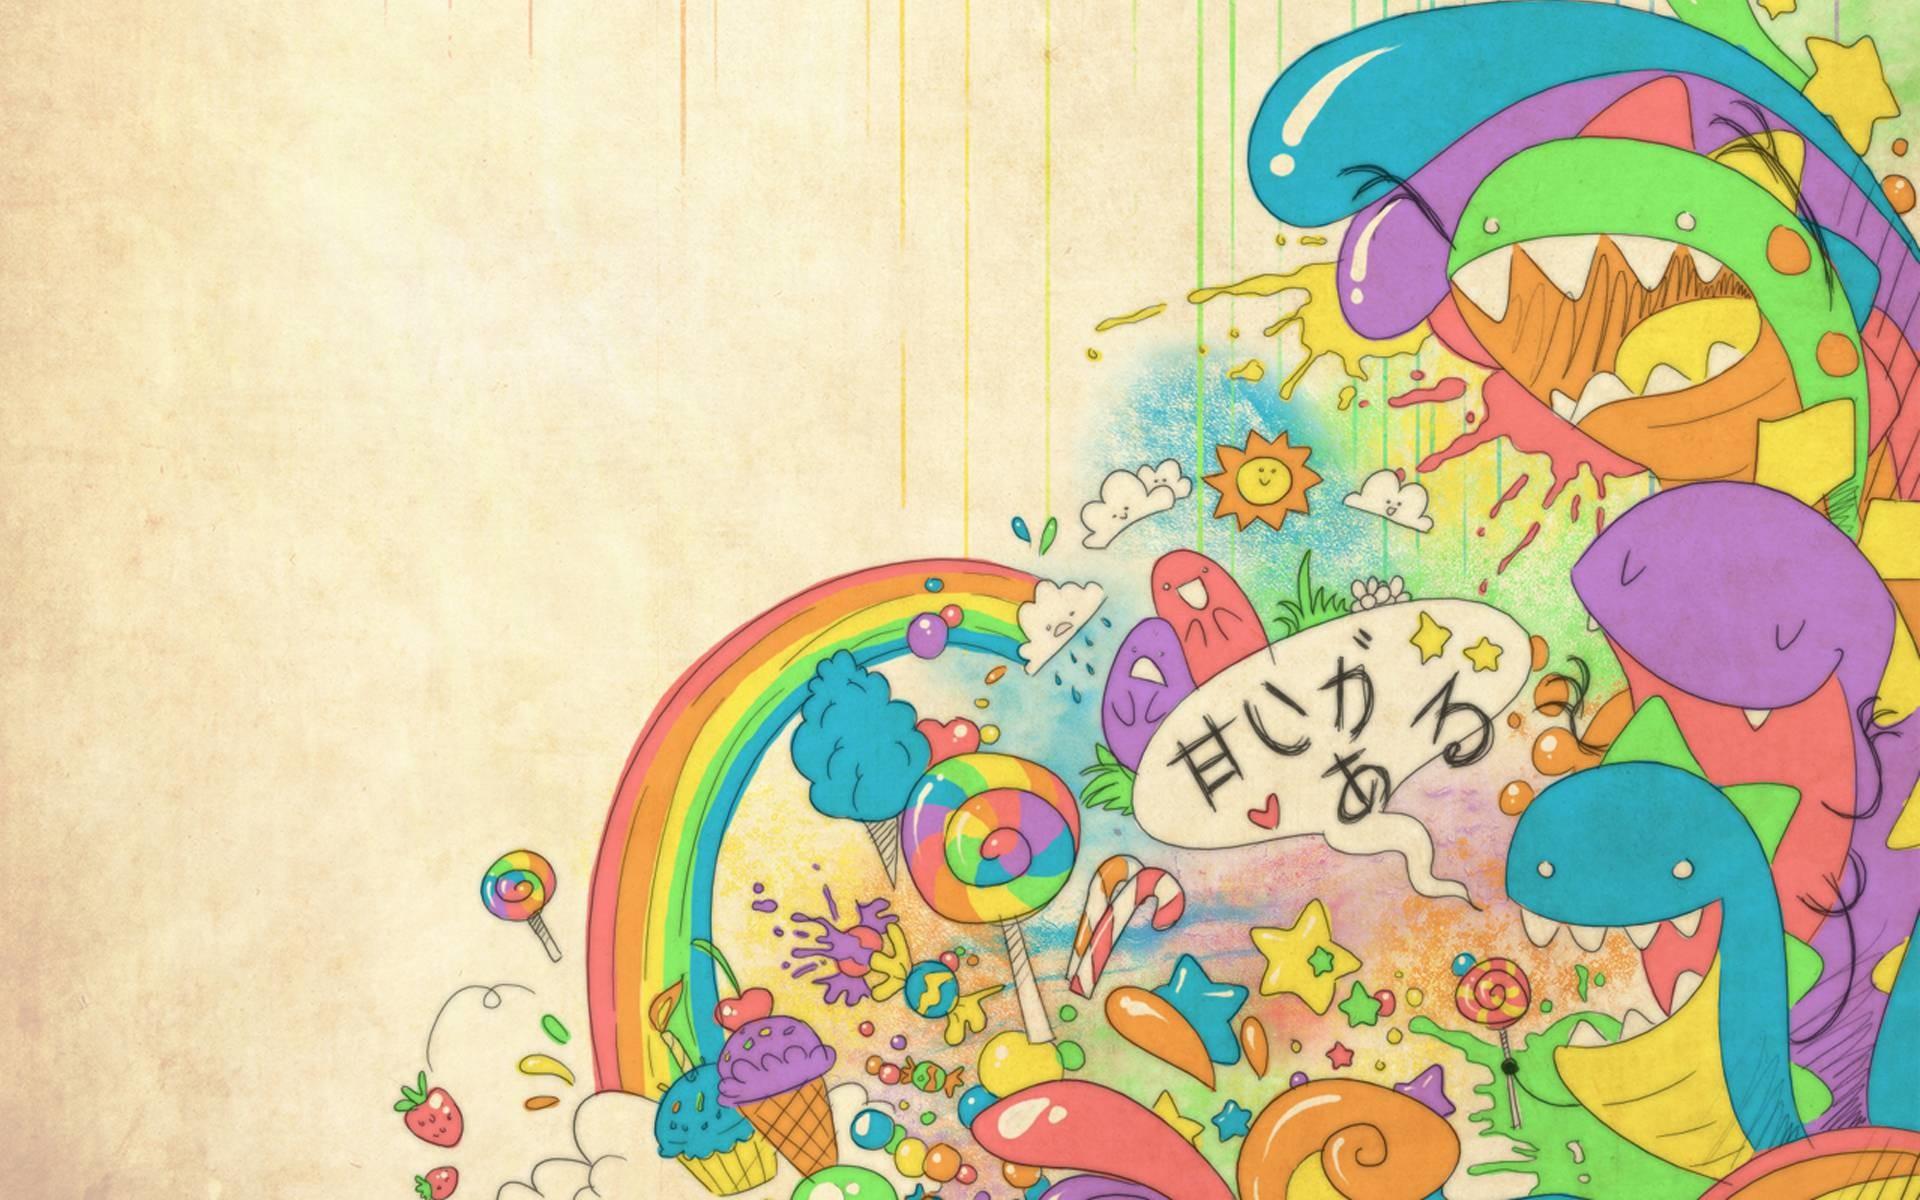 1920x1200 Cute Colorful Wallpaper